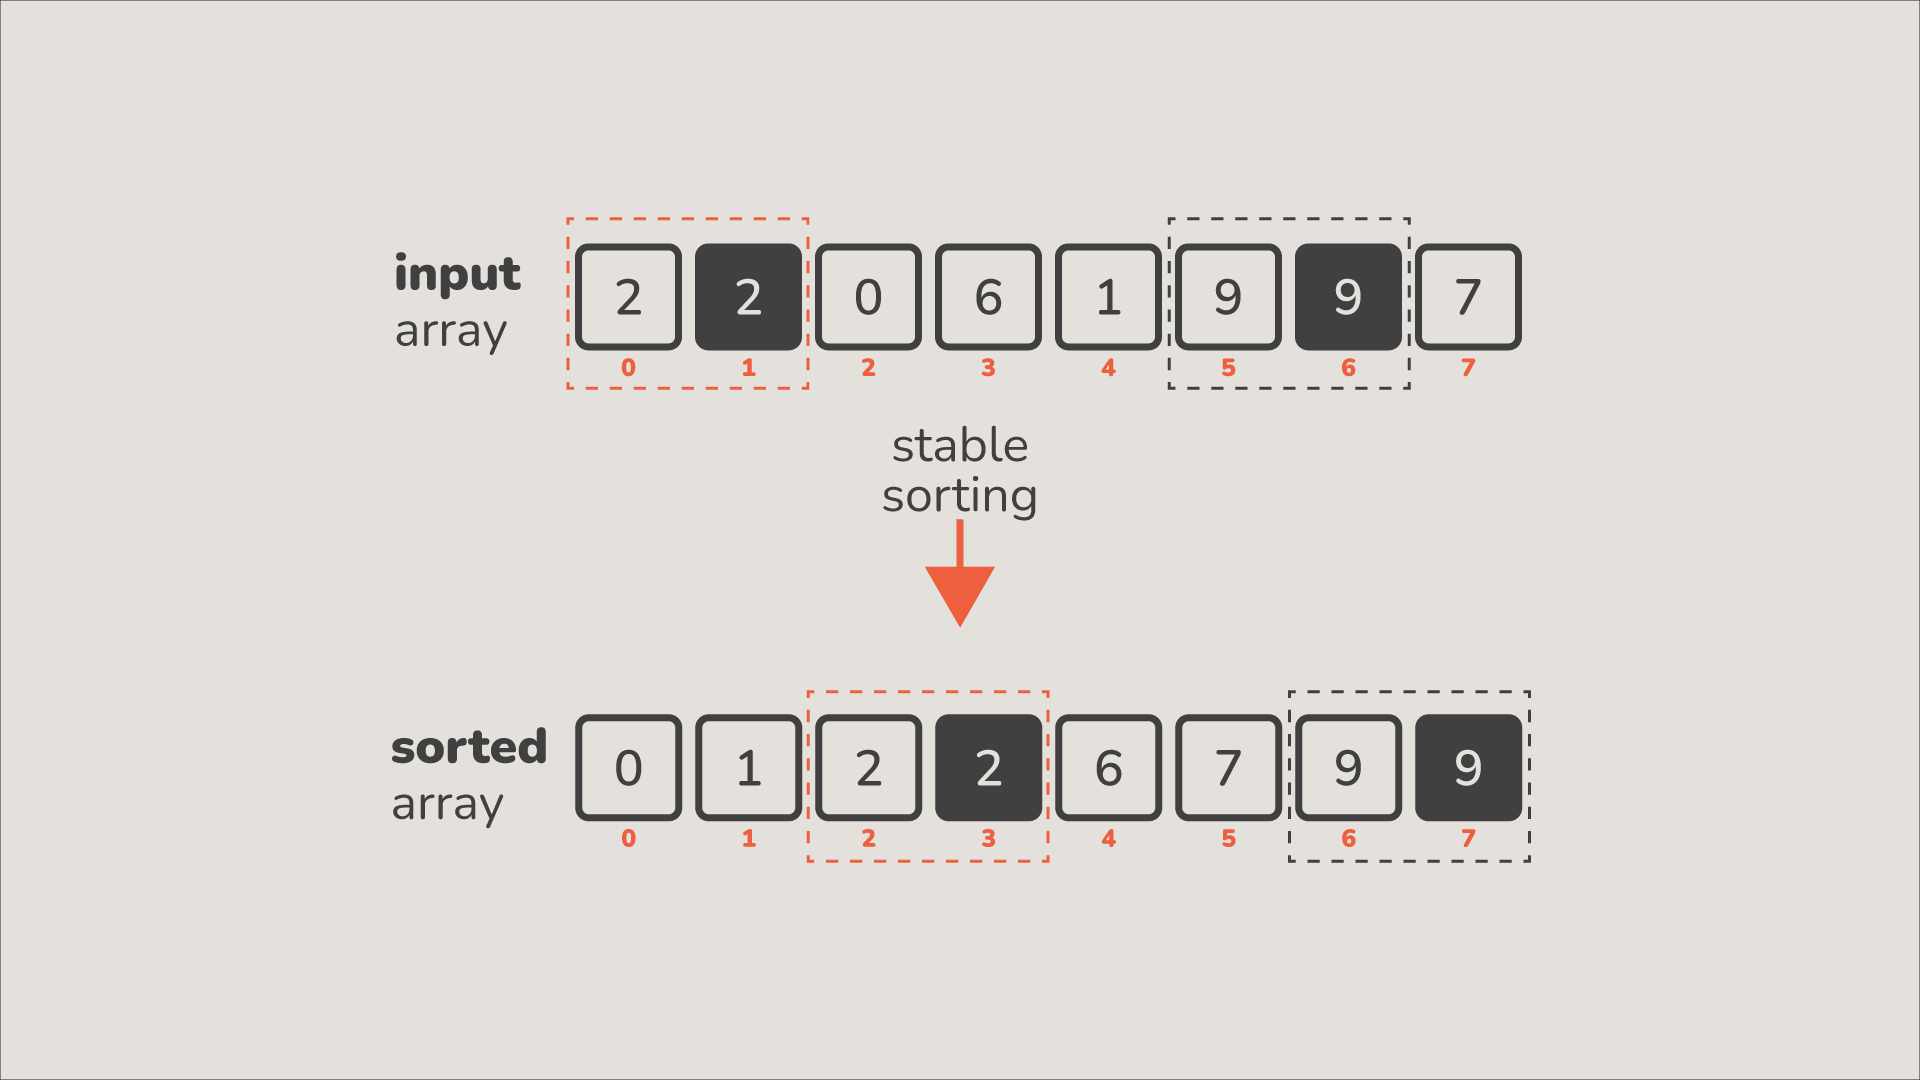 stable sorting illustration